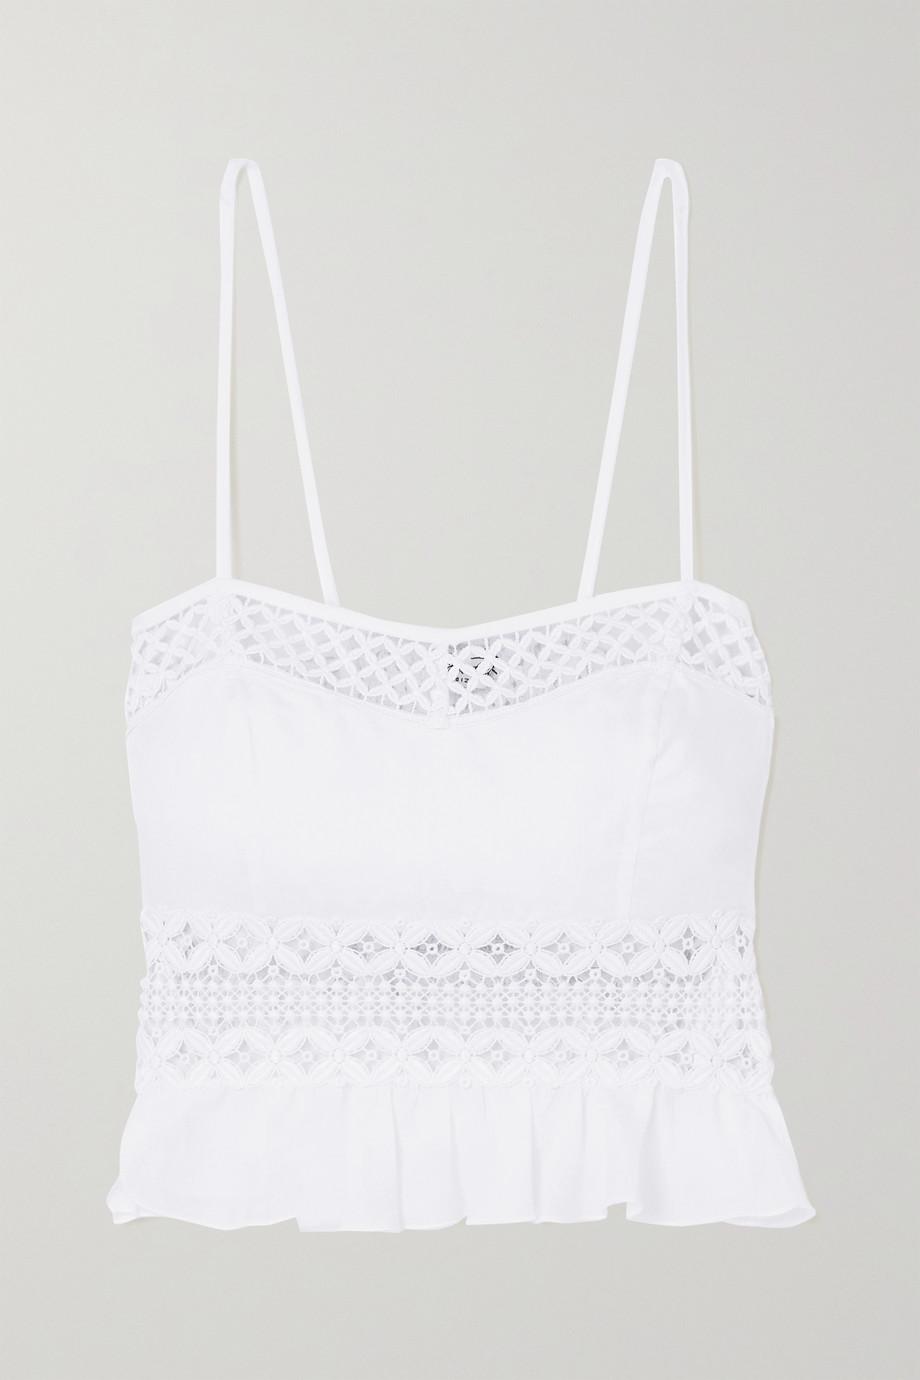 Charo Ruiz Crocheted lace-trimmed cotton-blend poplin top